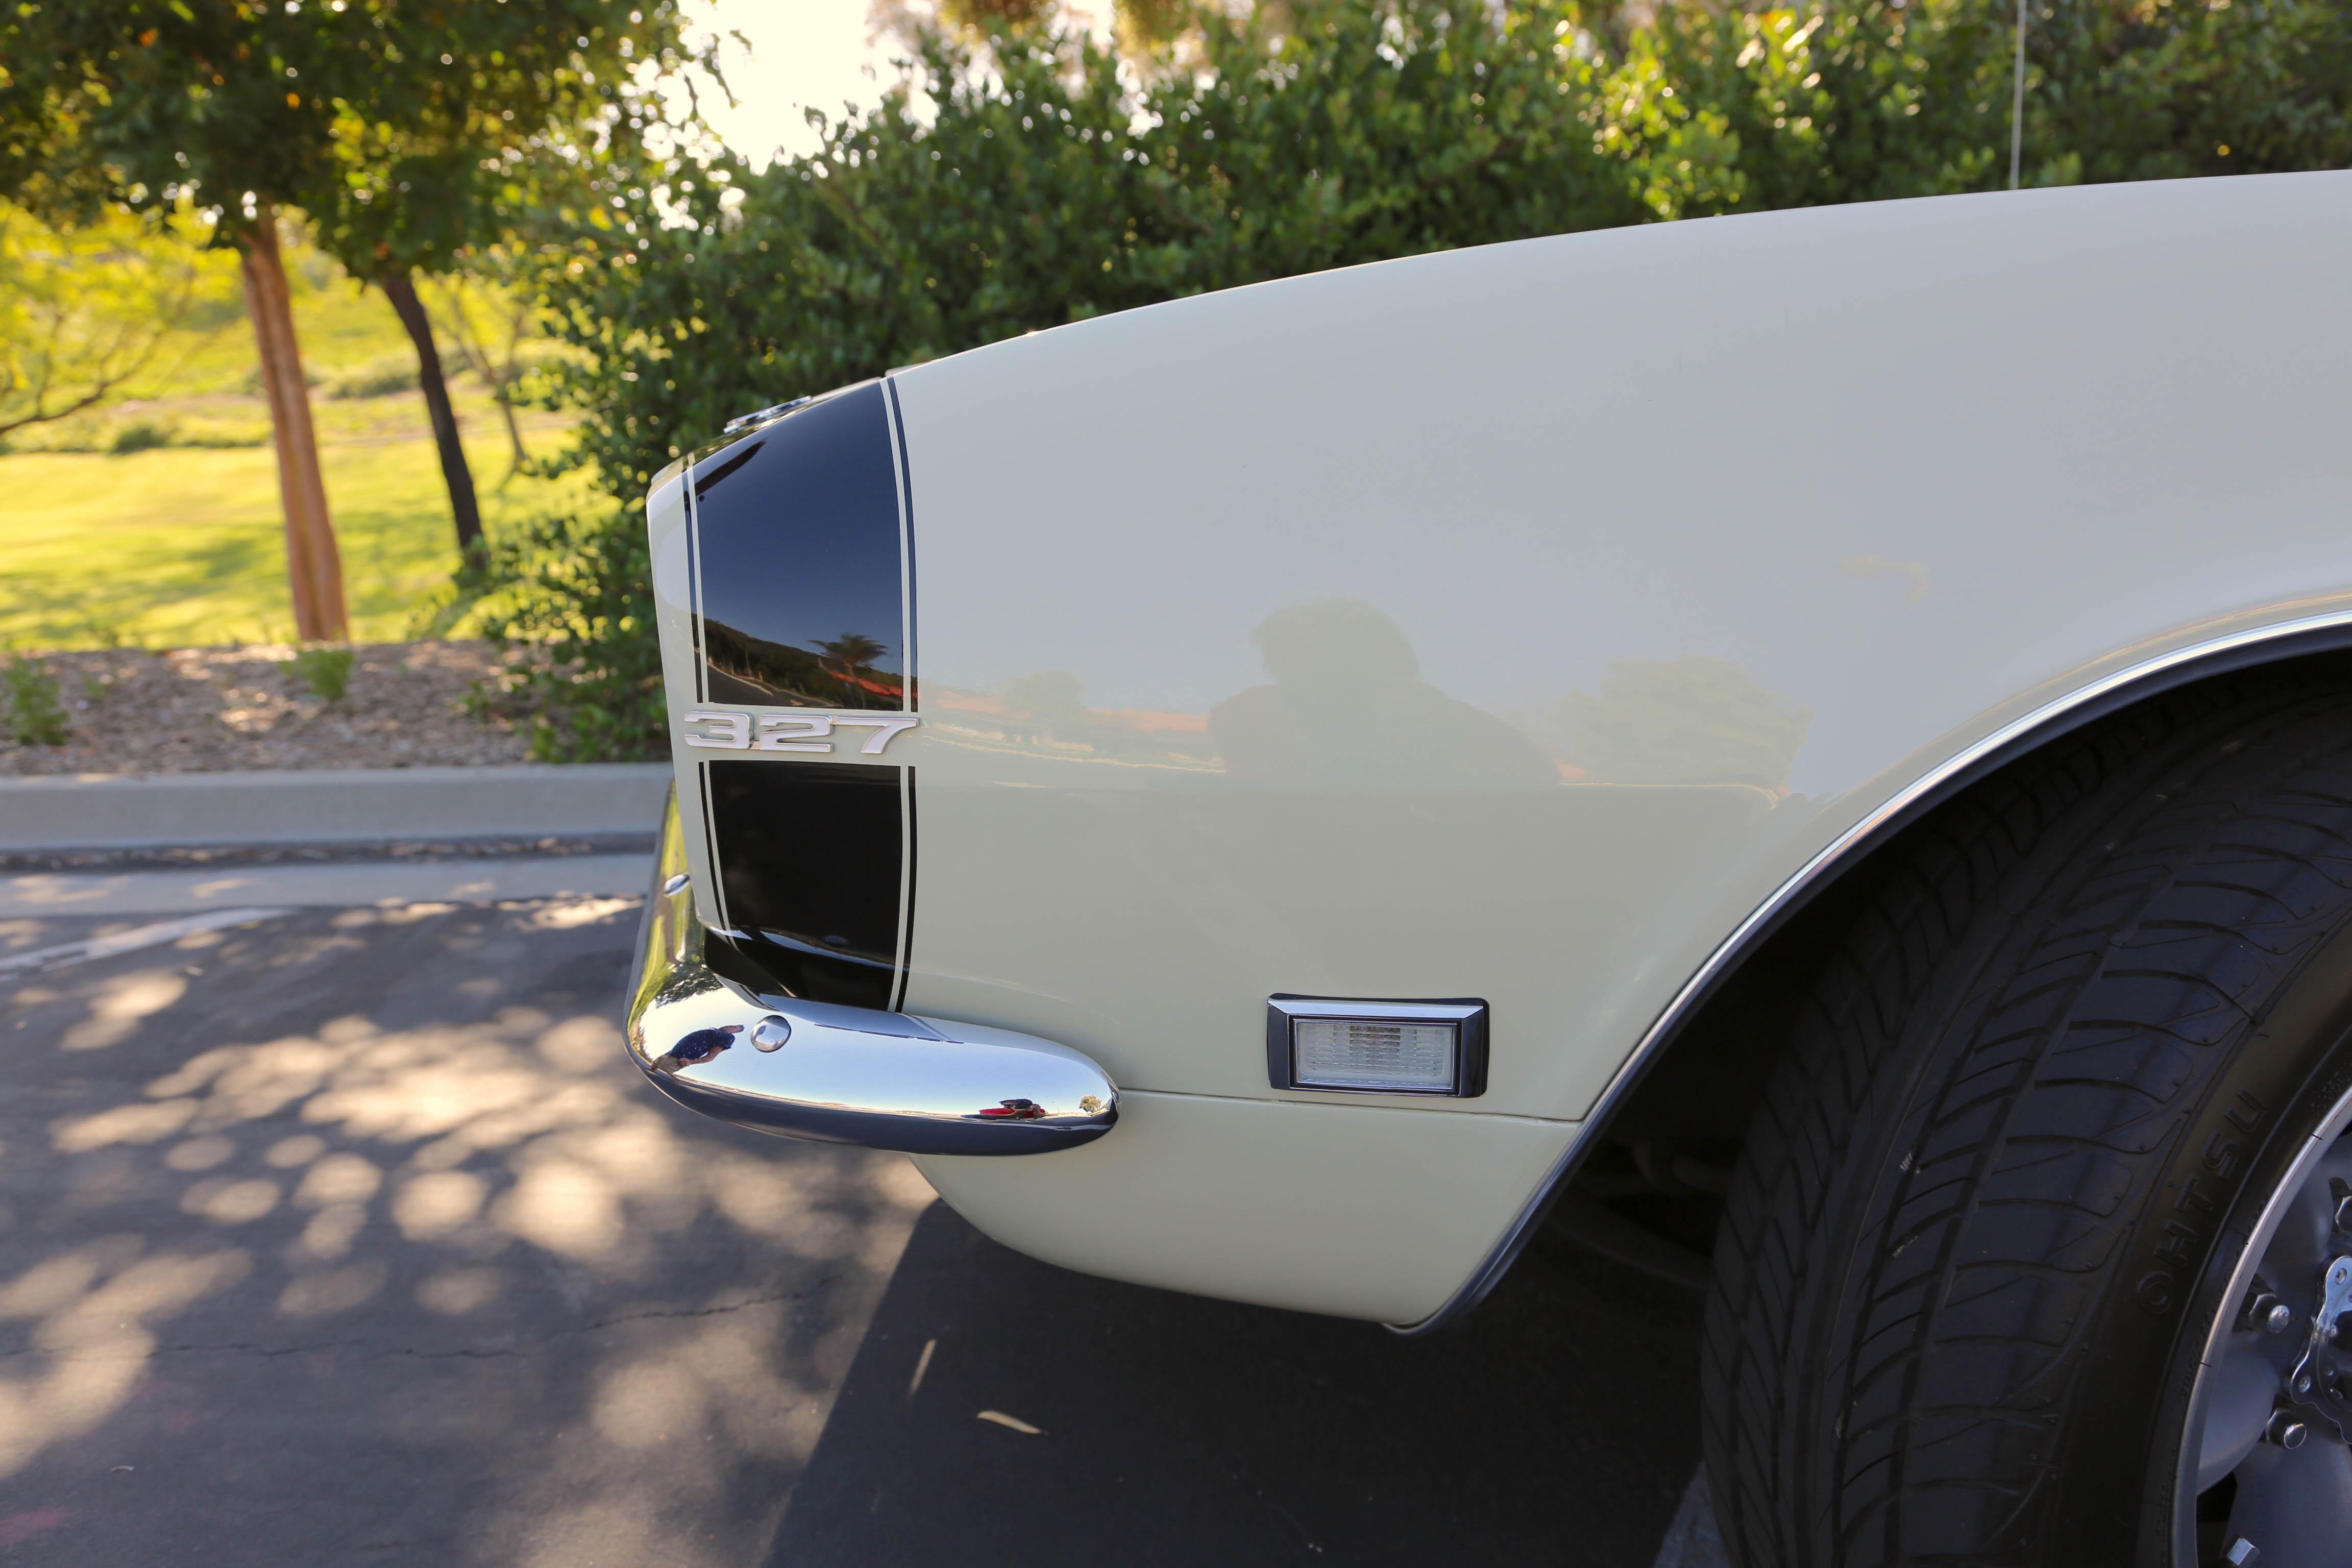 1968 Camaro Odd Options Front stripes